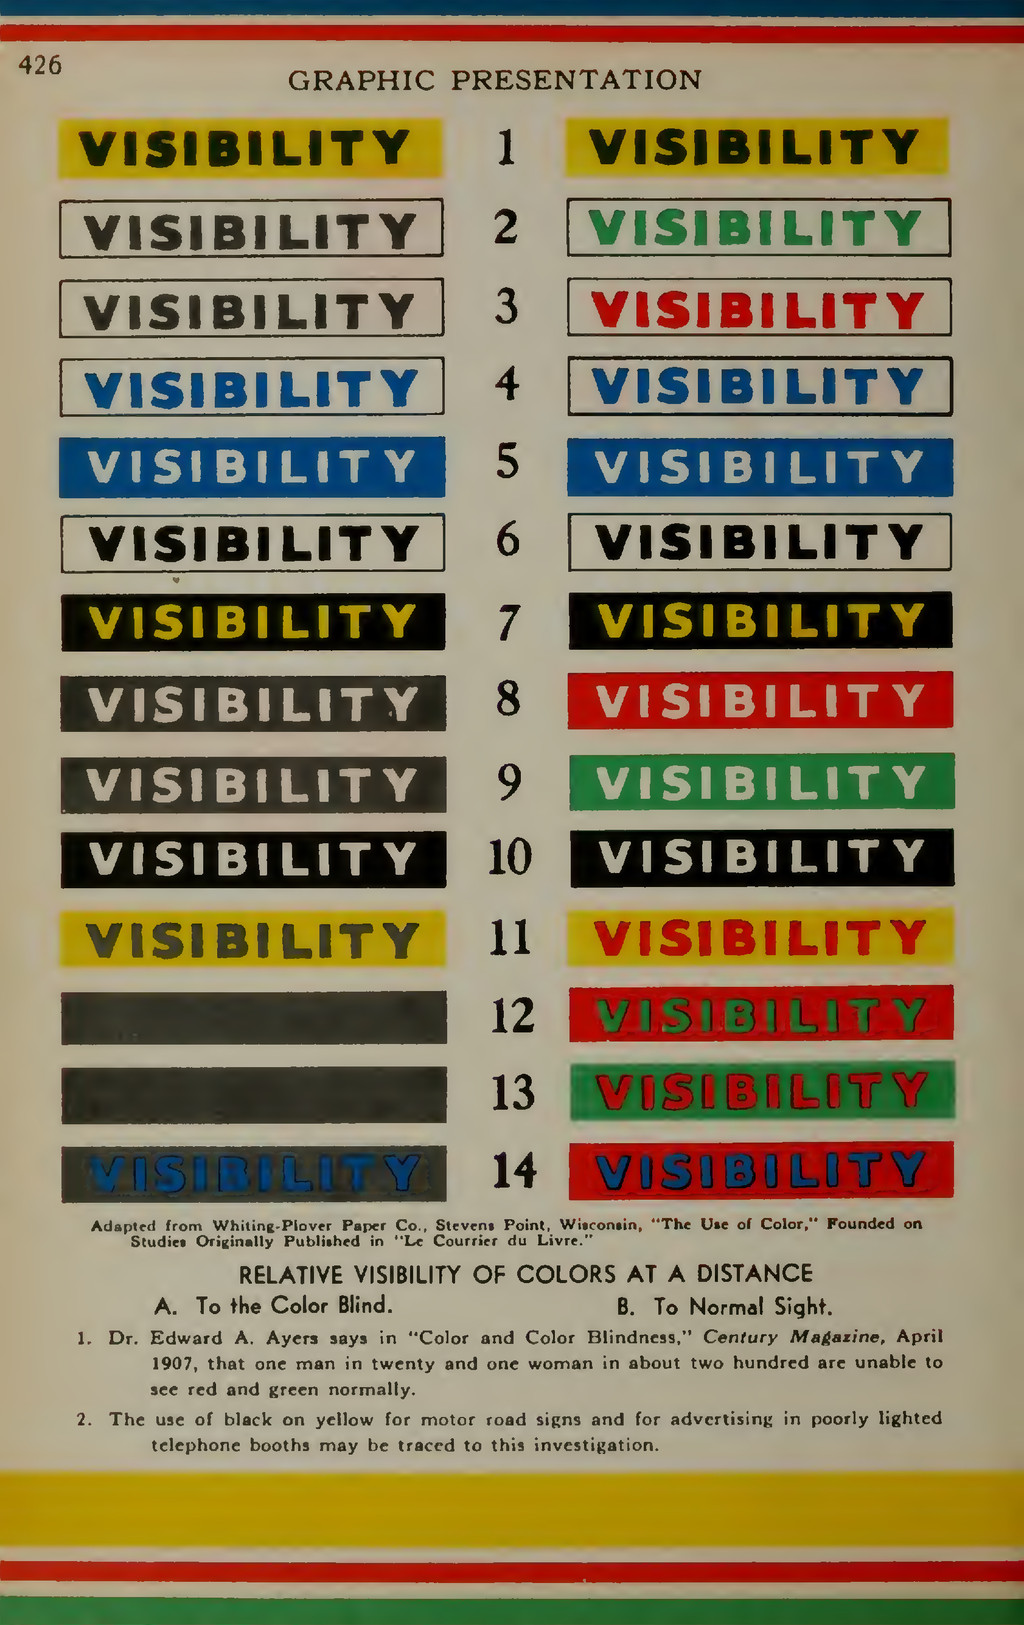 426 GRAPHIC PRESENTATION VISIBILITY VISIBILITY ...